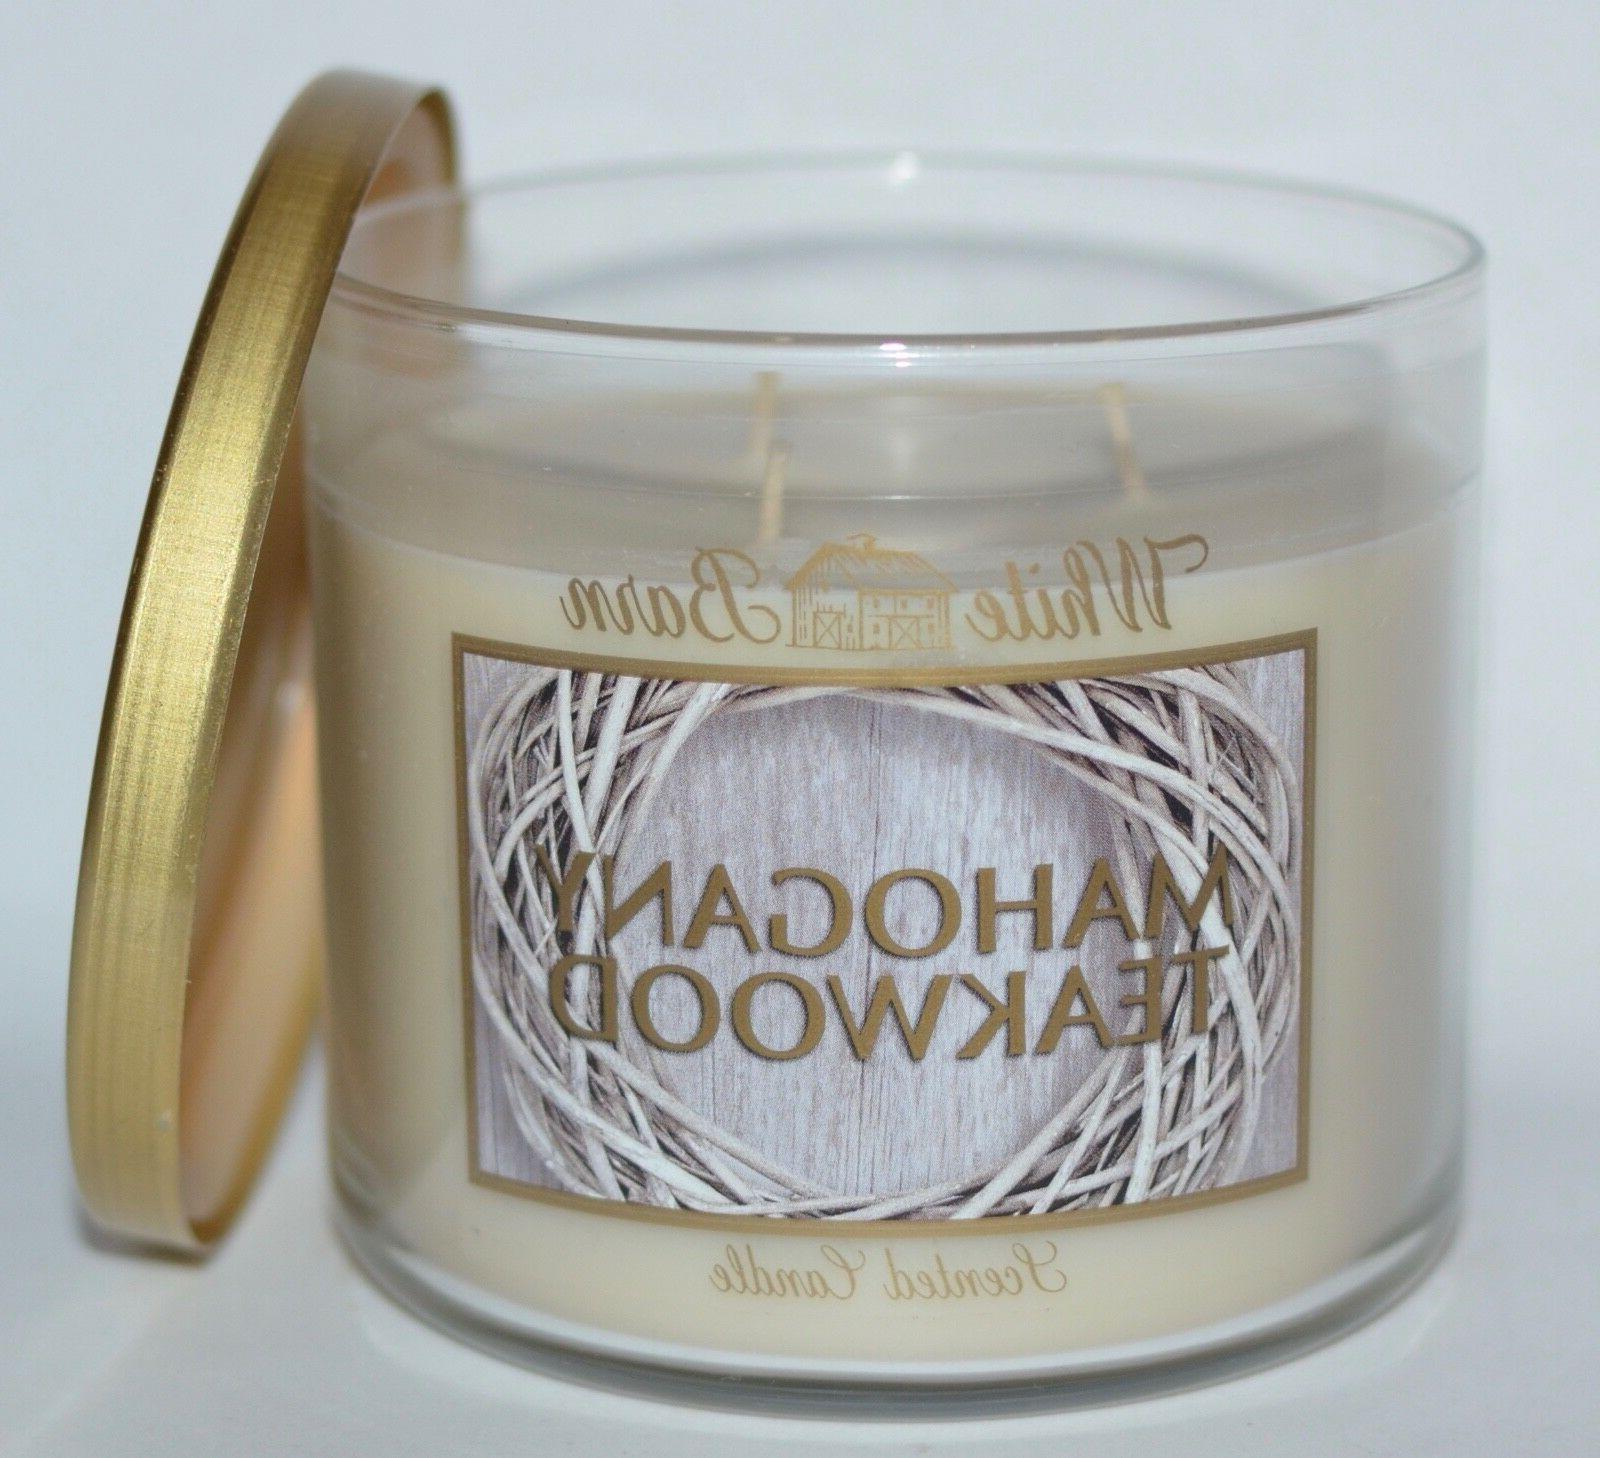 mahogany teakwood 3 wick scented